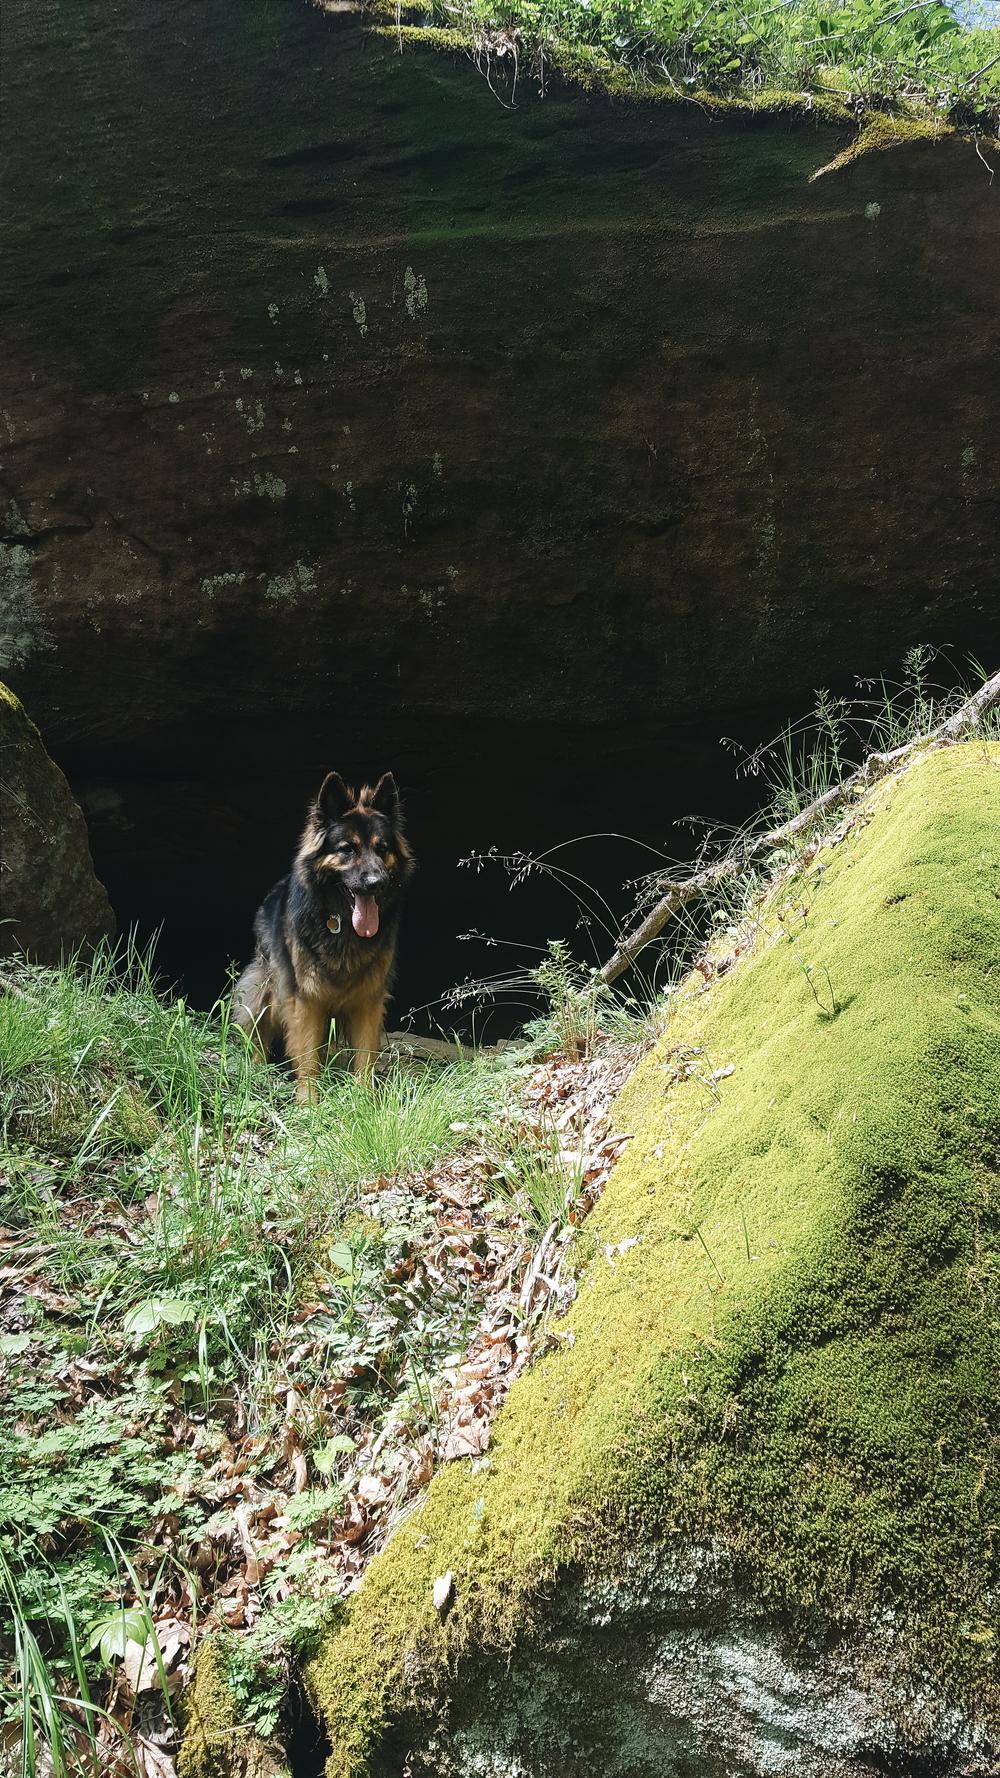 hiking_cave_fenrir_ohio